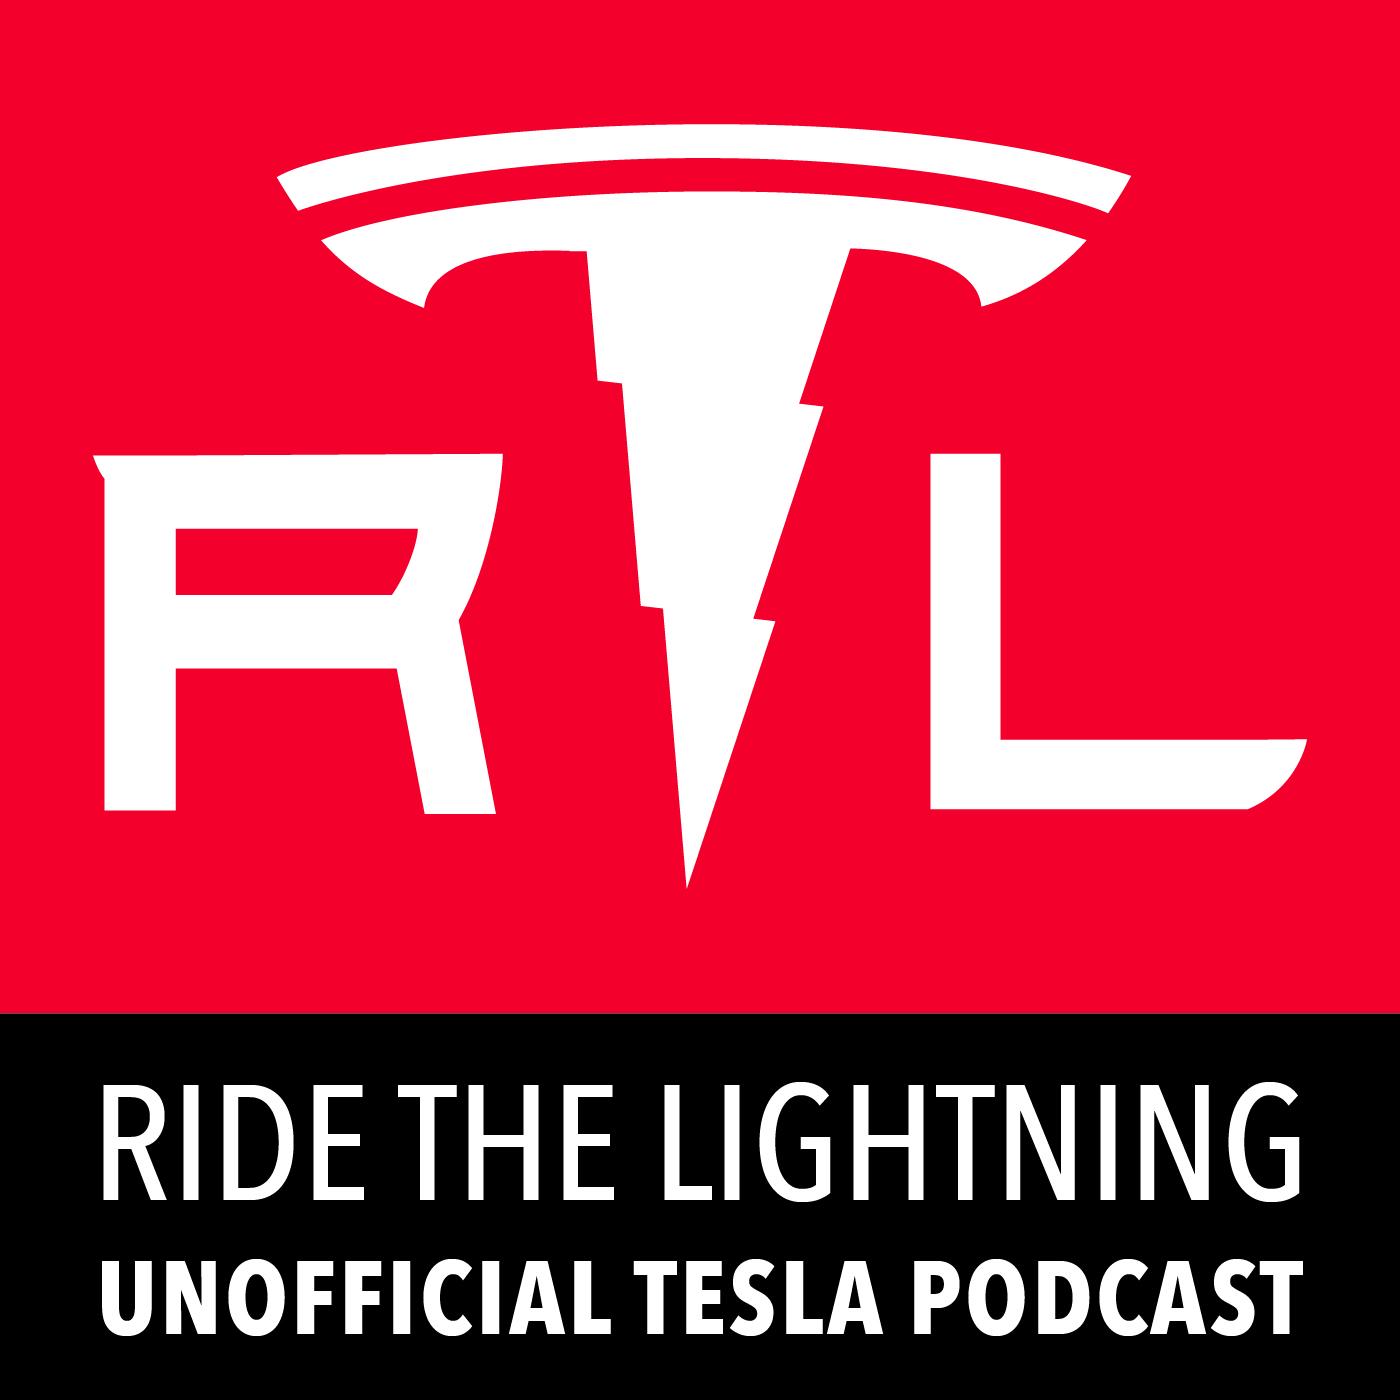 Ride the Lightning: Tesla Motors Unofficial Podcast show art